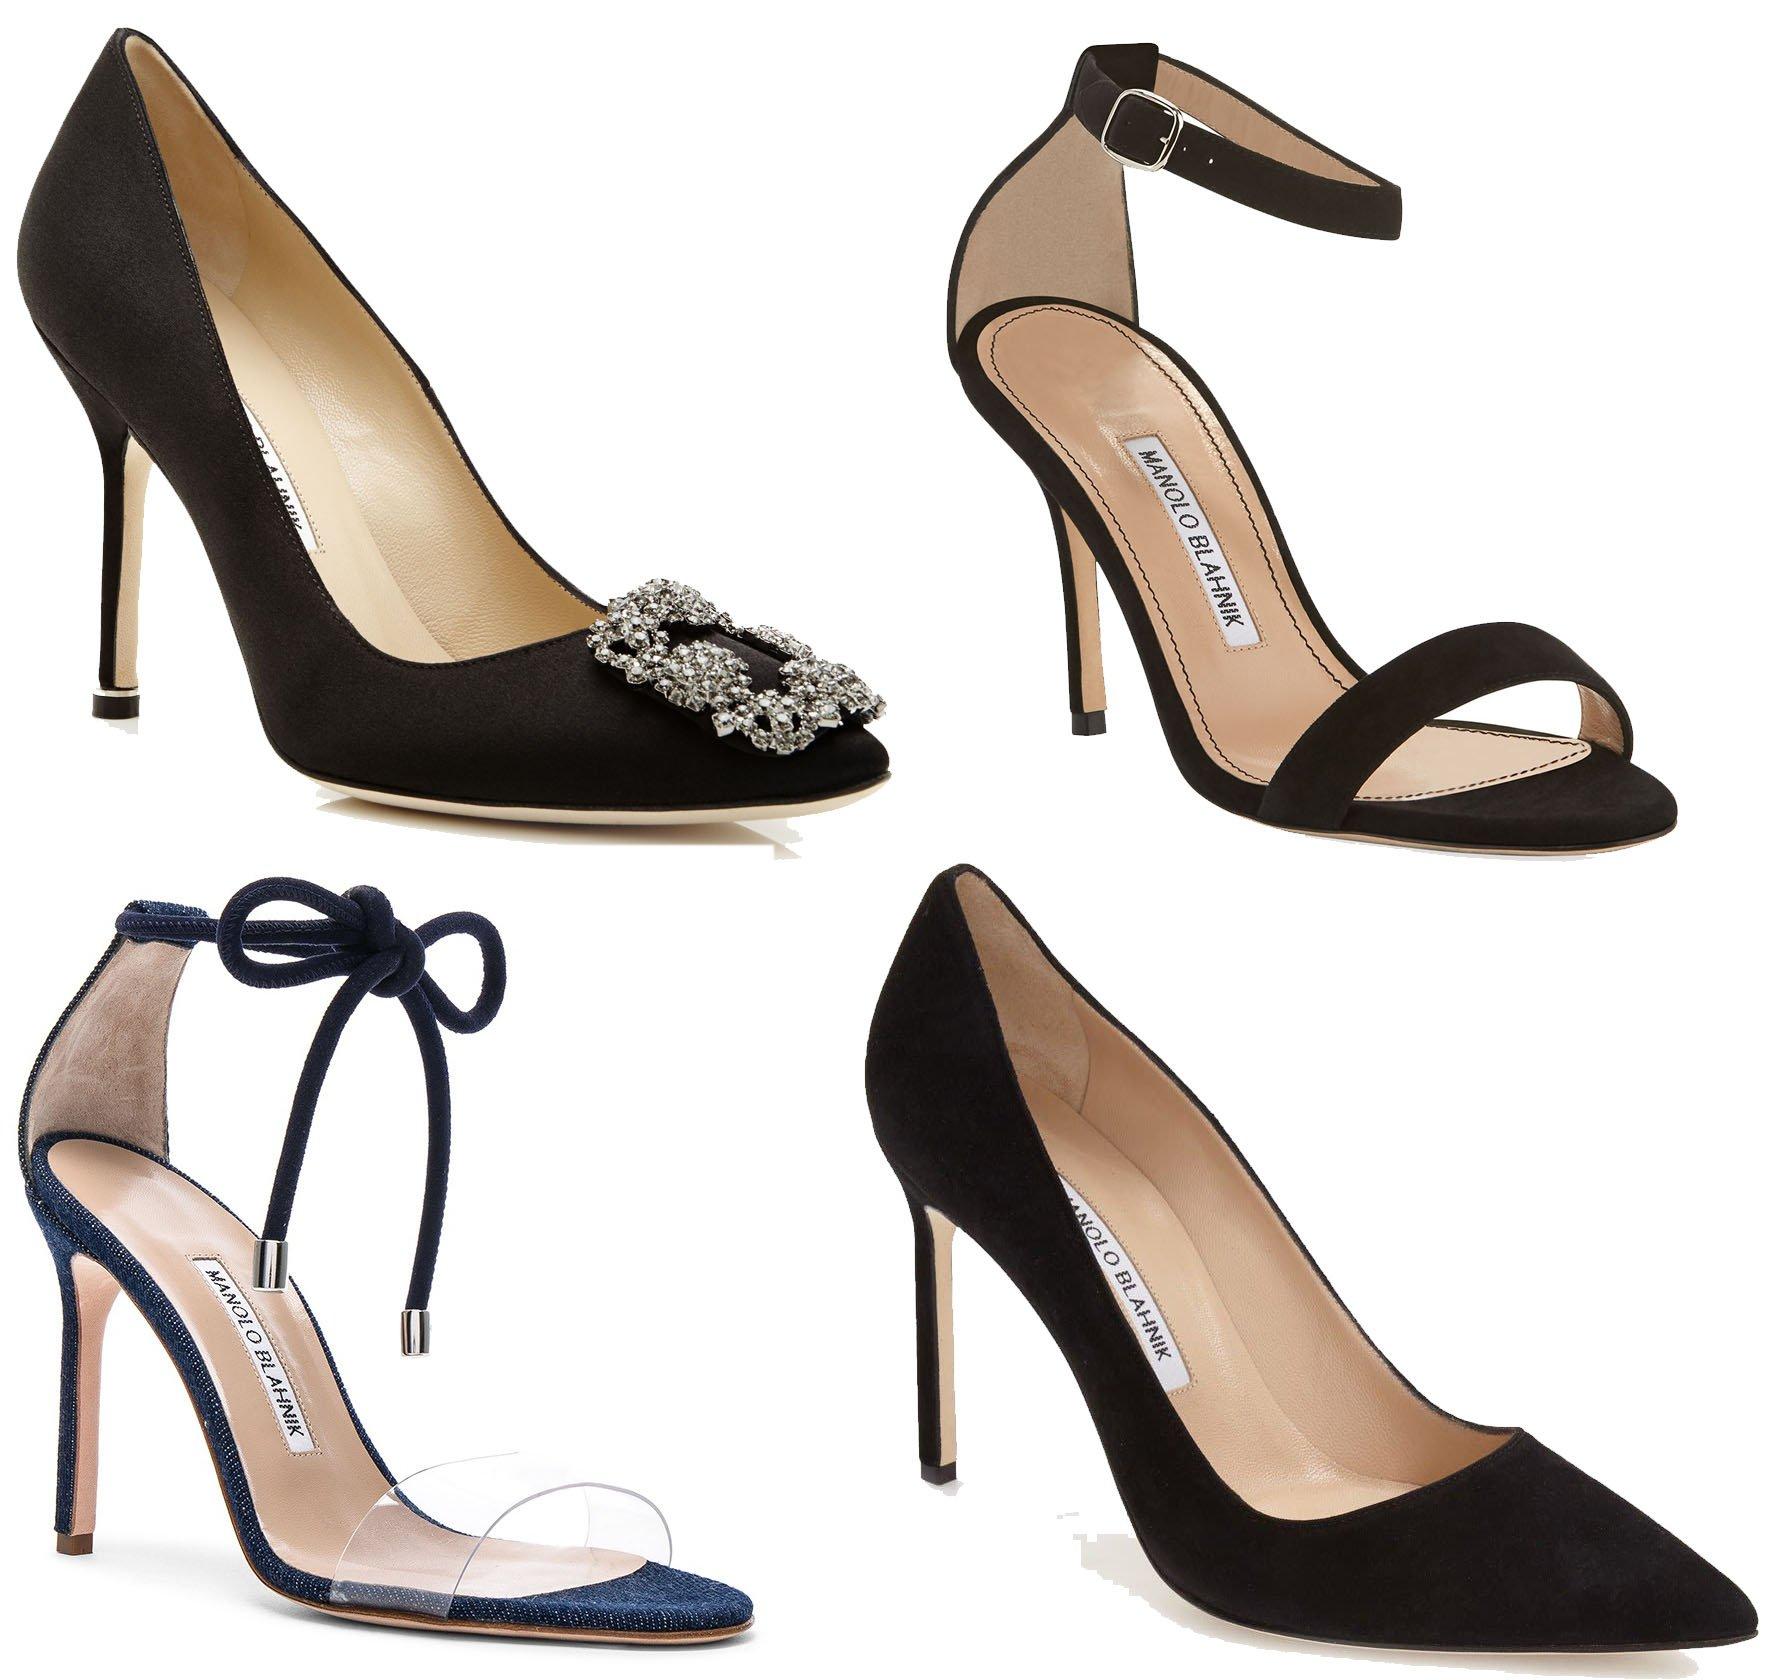 Manolo Blahnik's Hangisi pumps, Chaos sandals, Estro, and BB pumps feature a timeless design